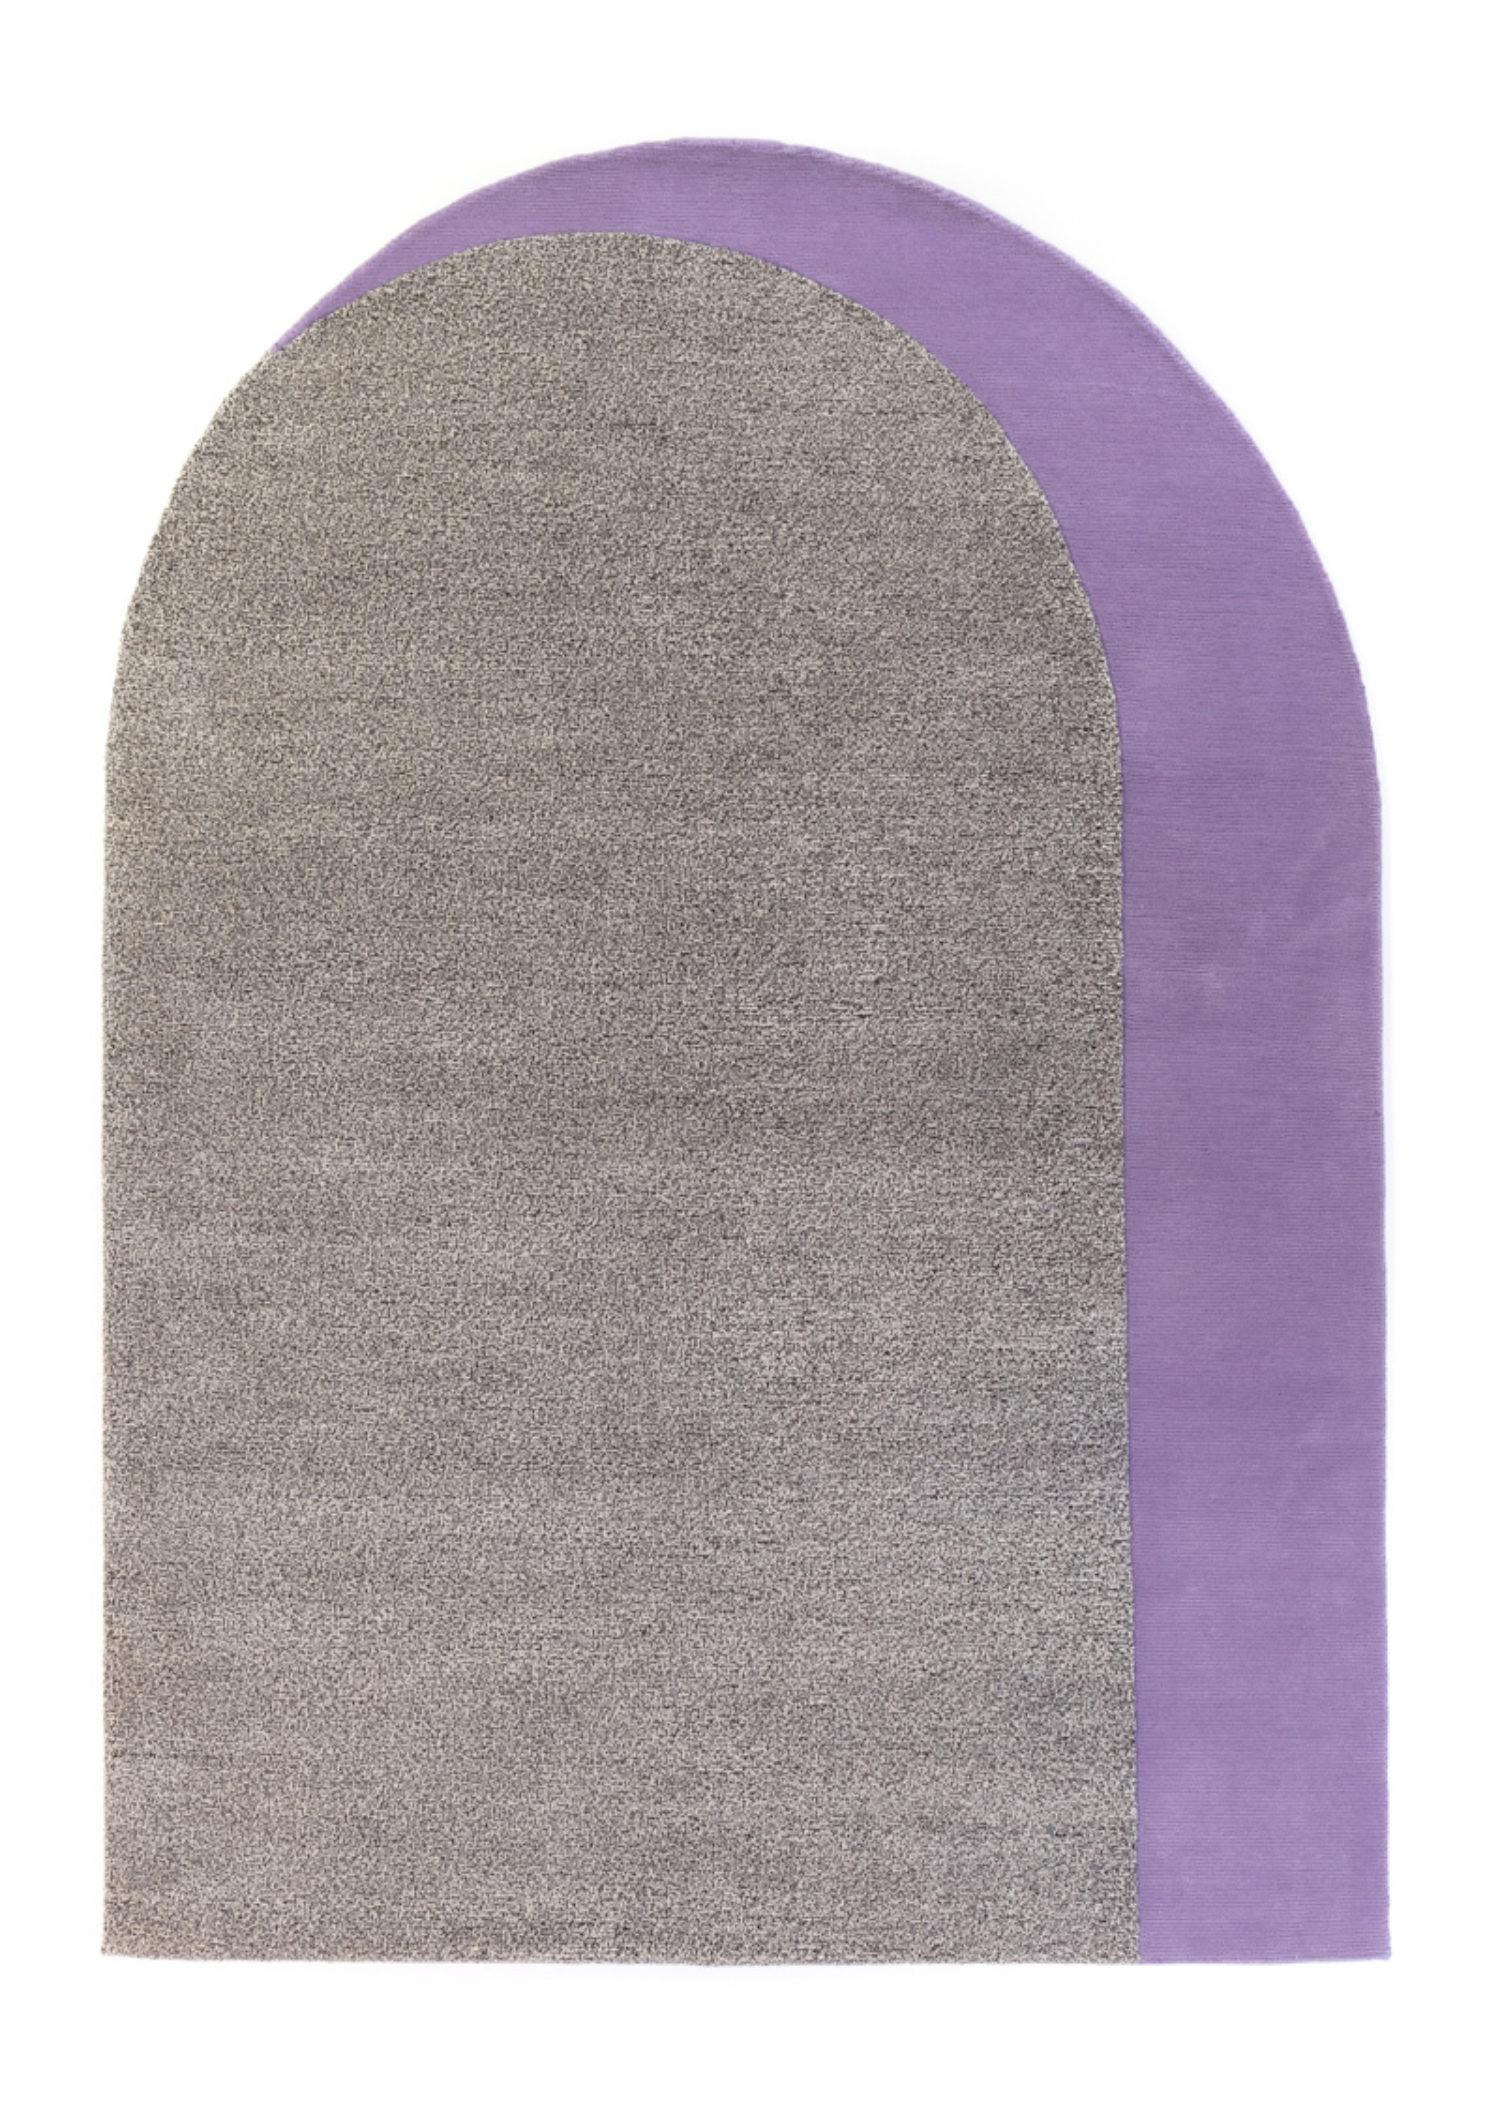 Archway Lilac